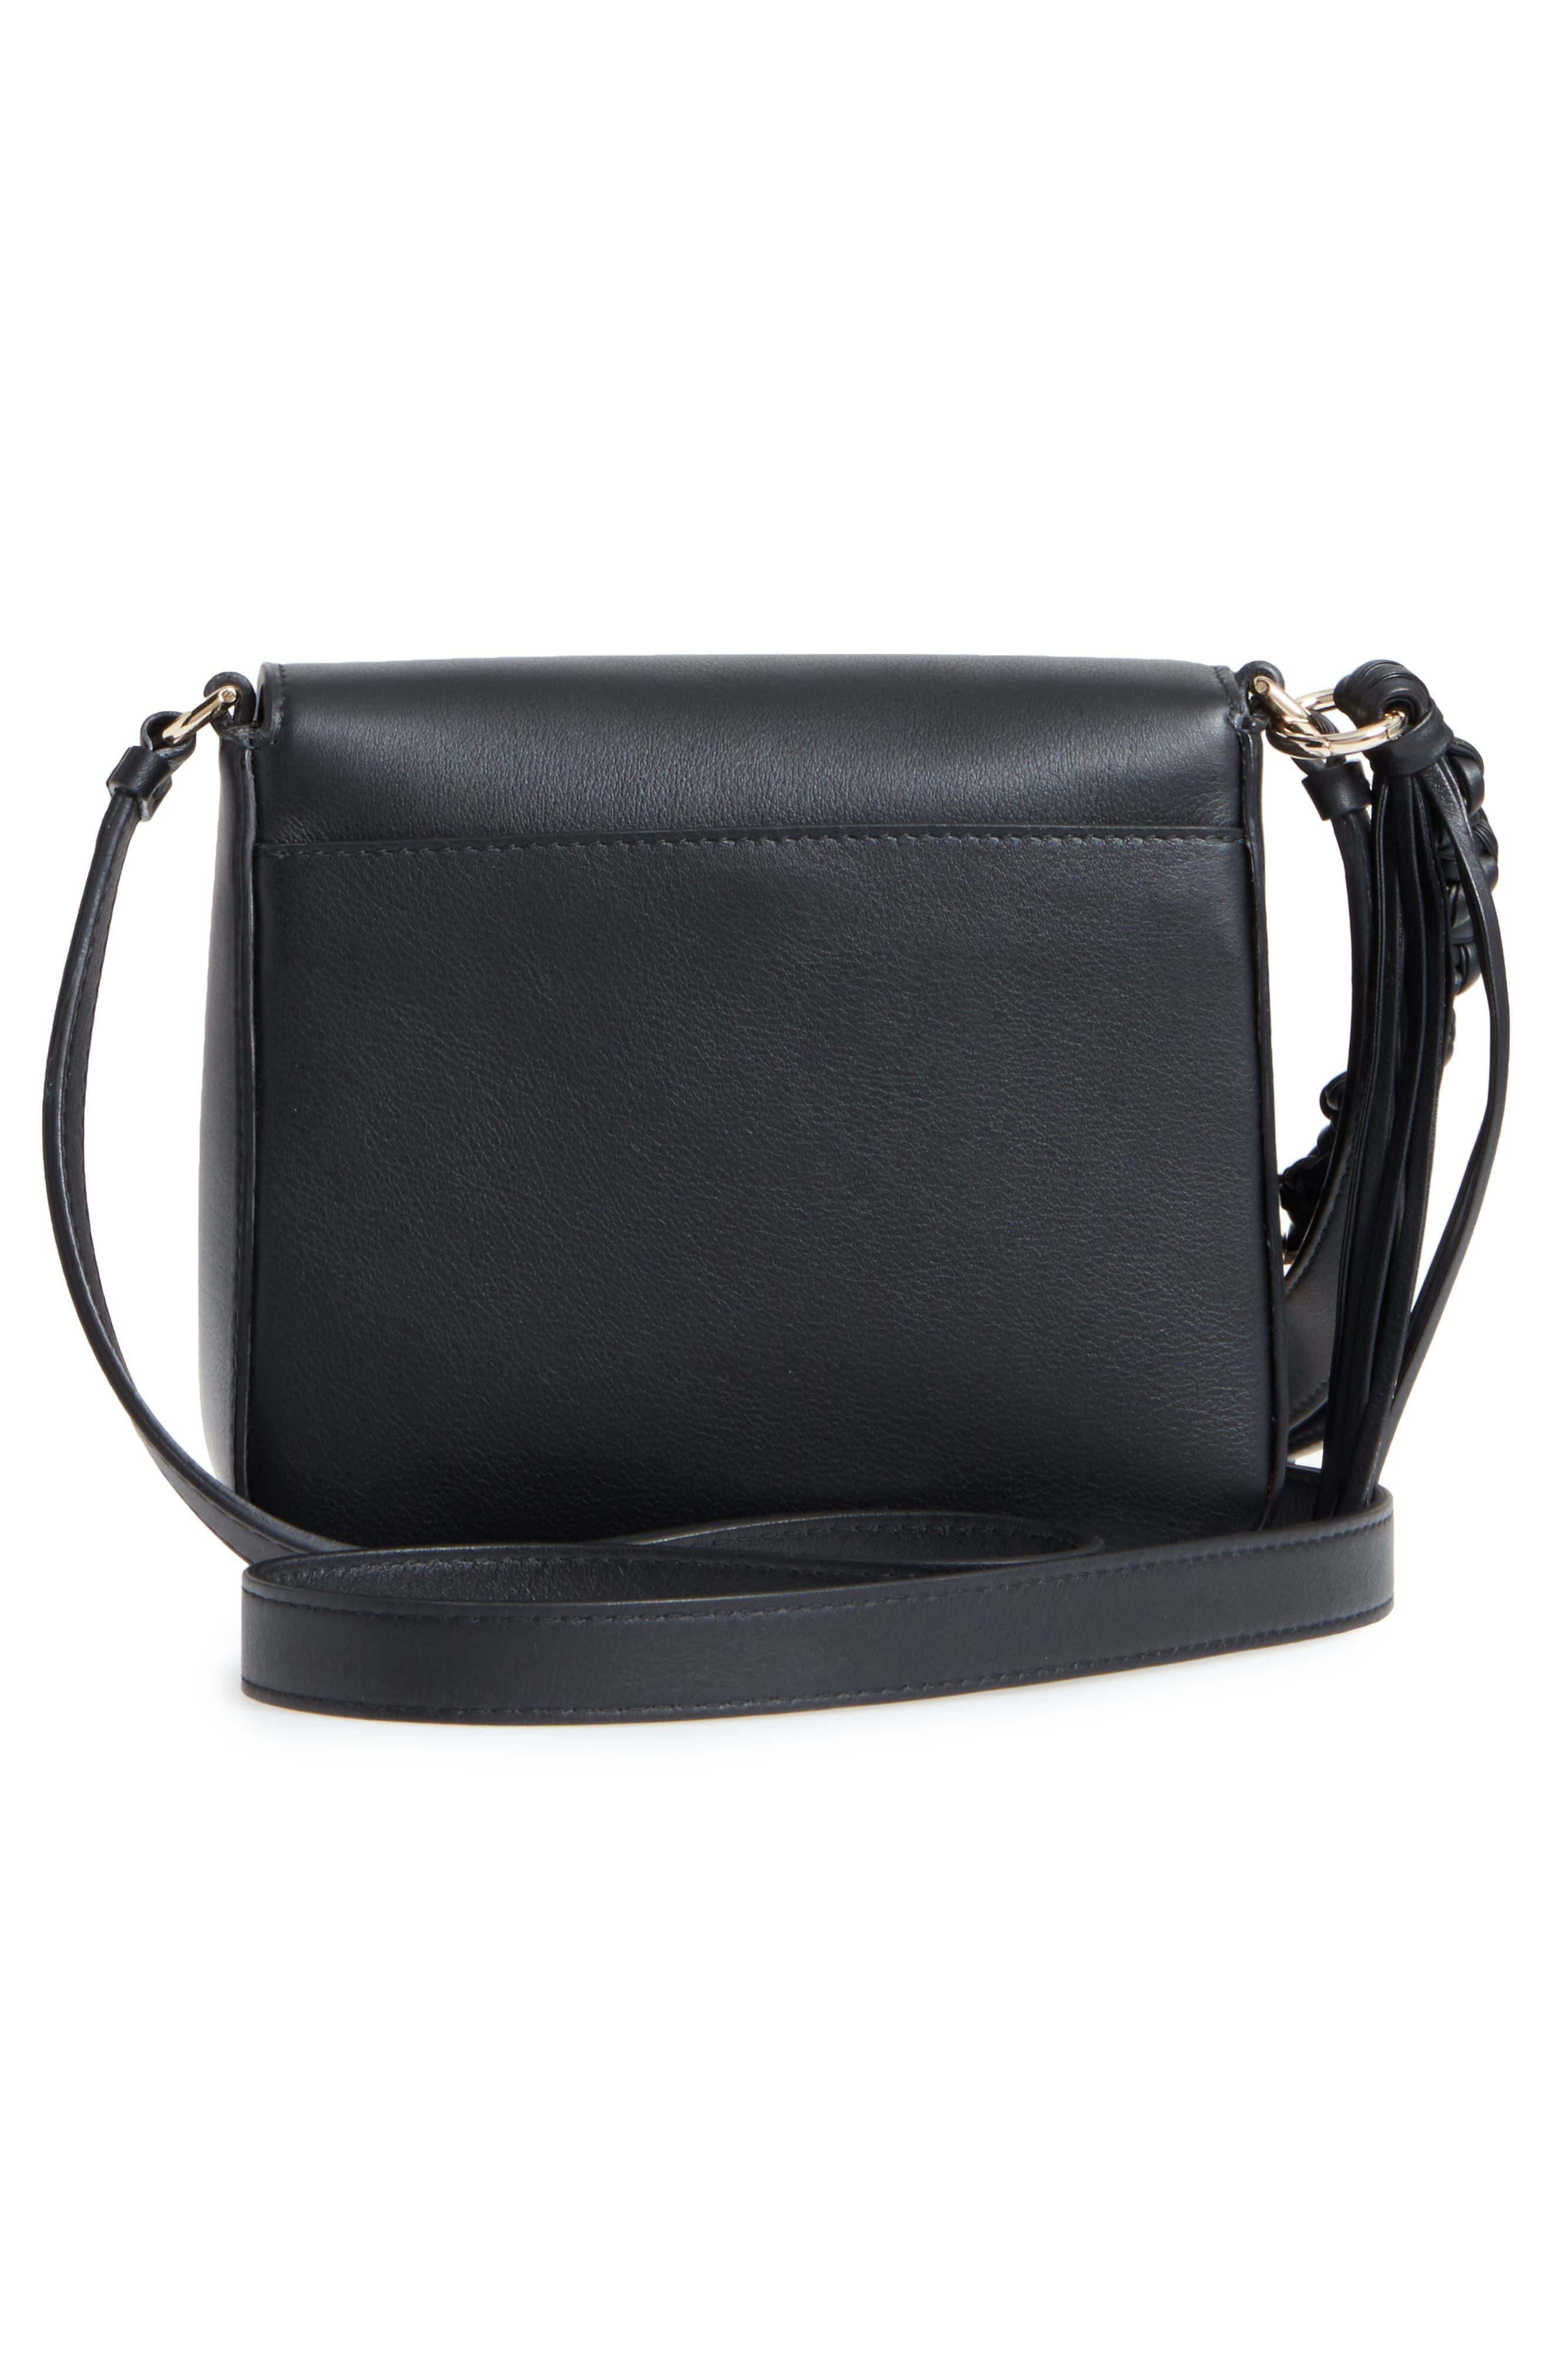 Gancio Lock Leather Crossbody Bag,                             Alternate thumbnail 3, color,                             Nero